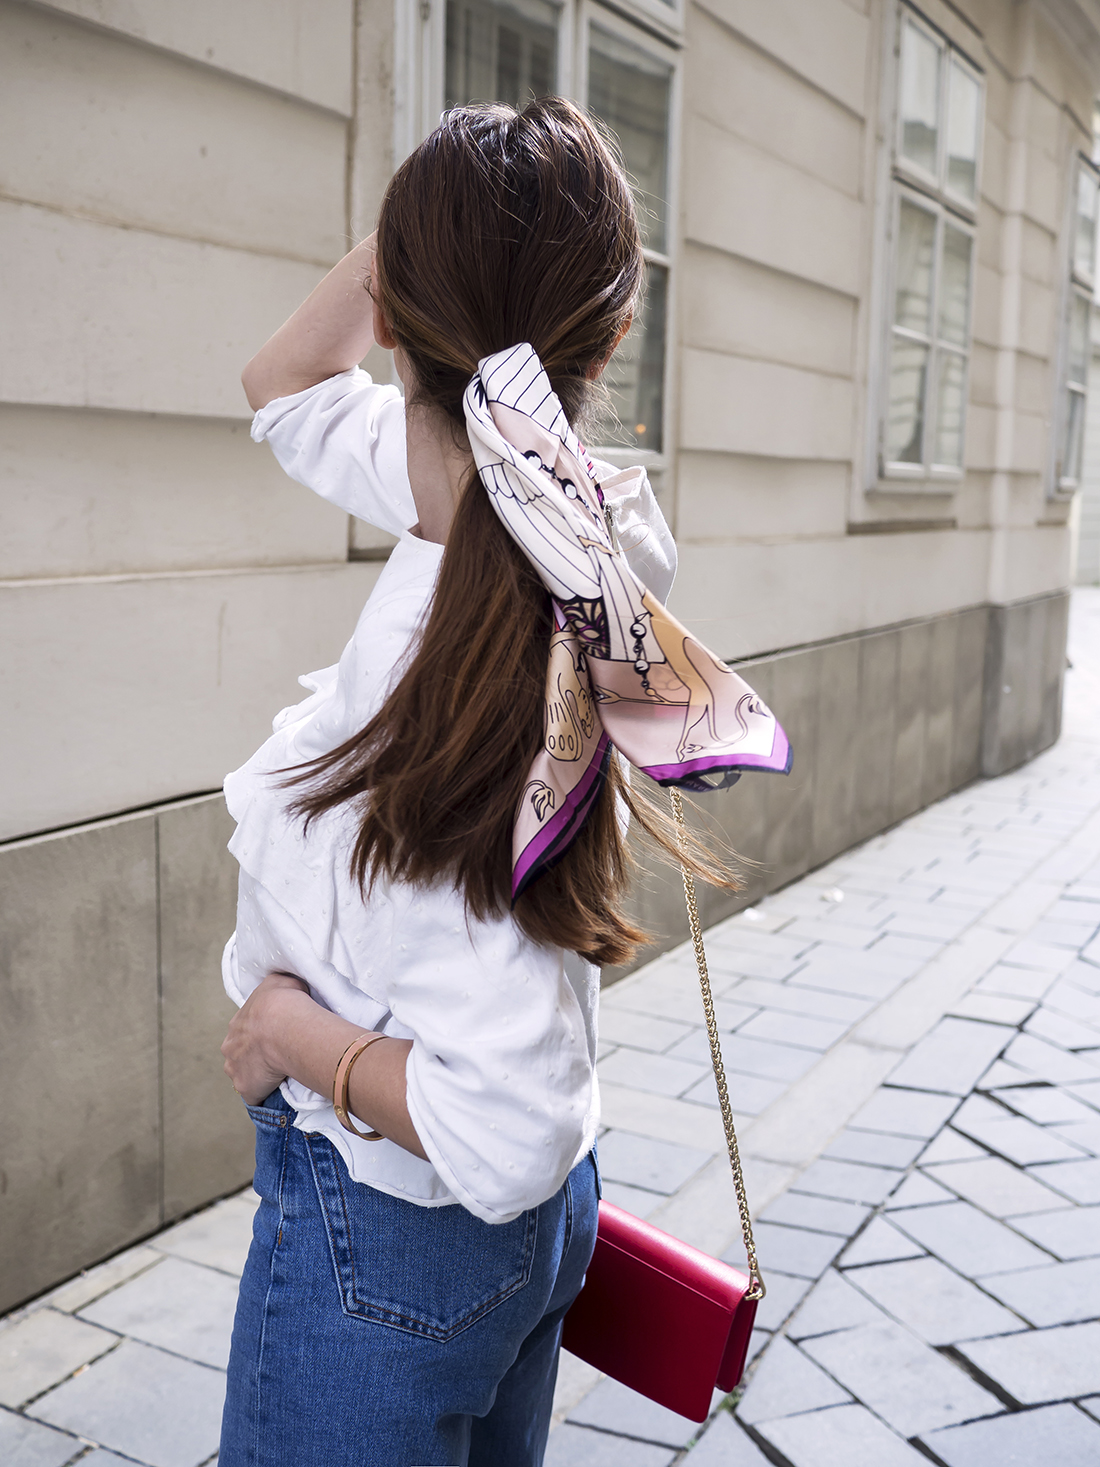 Hodvábna šatka vo vlasoch